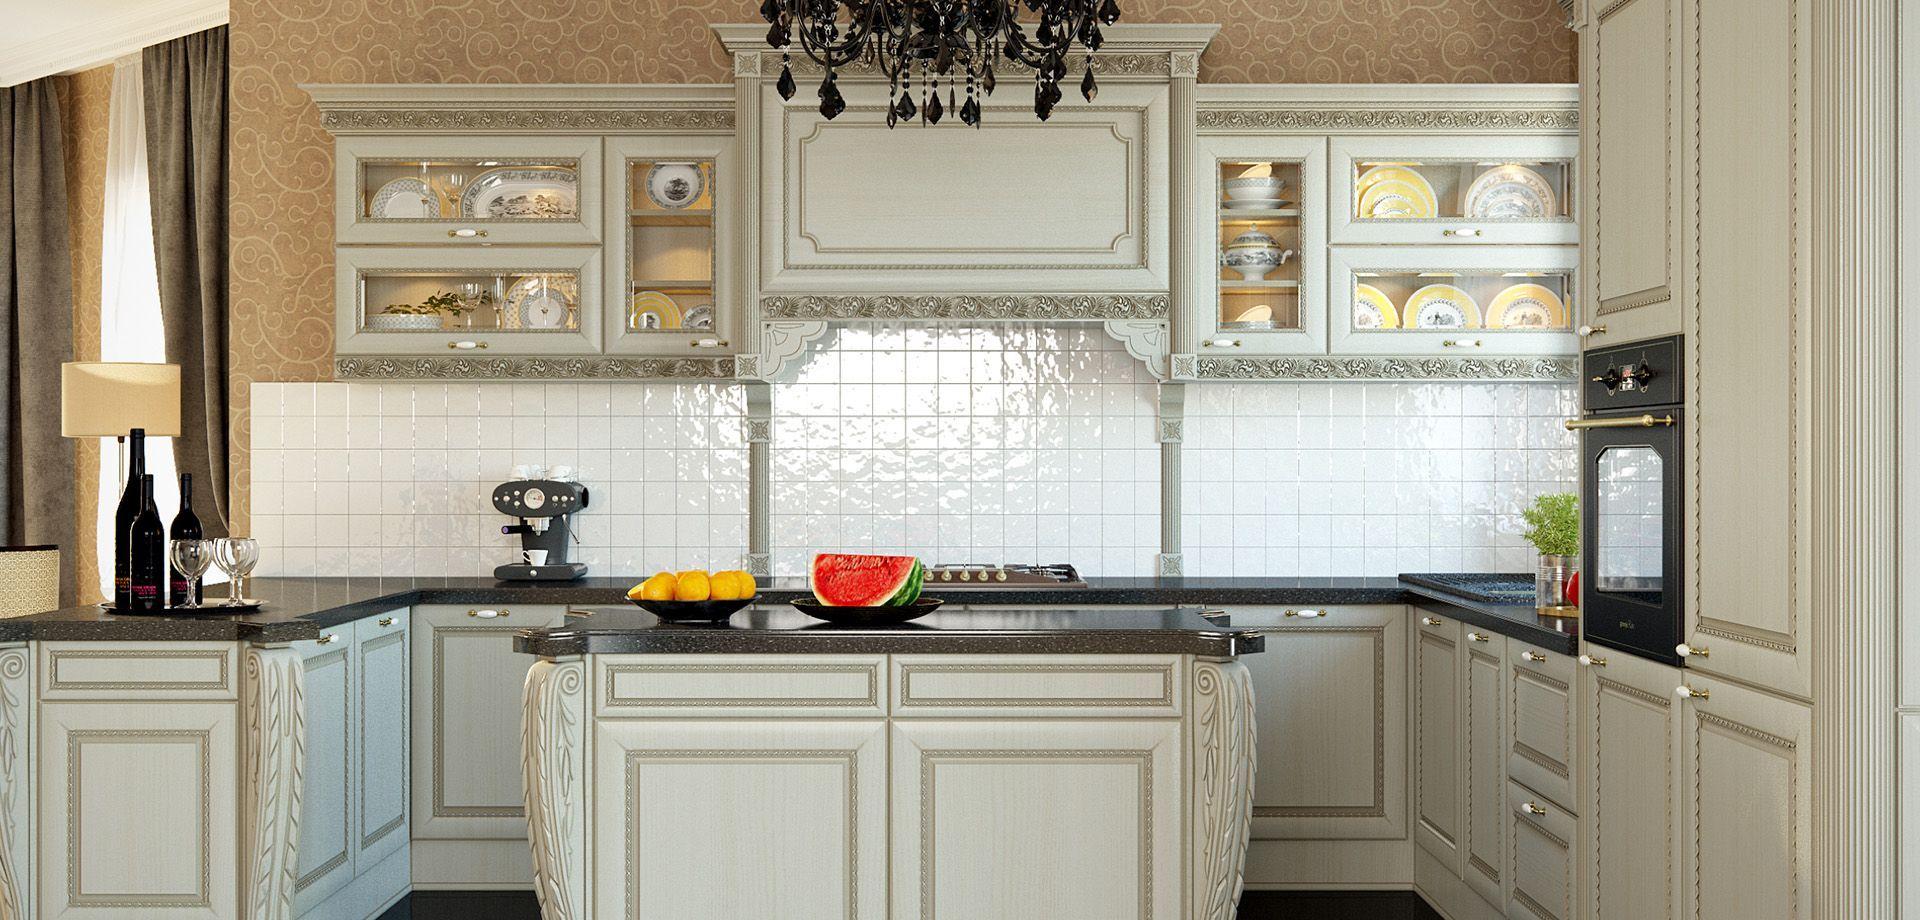 Кухни зо каталог цены официальный сайт